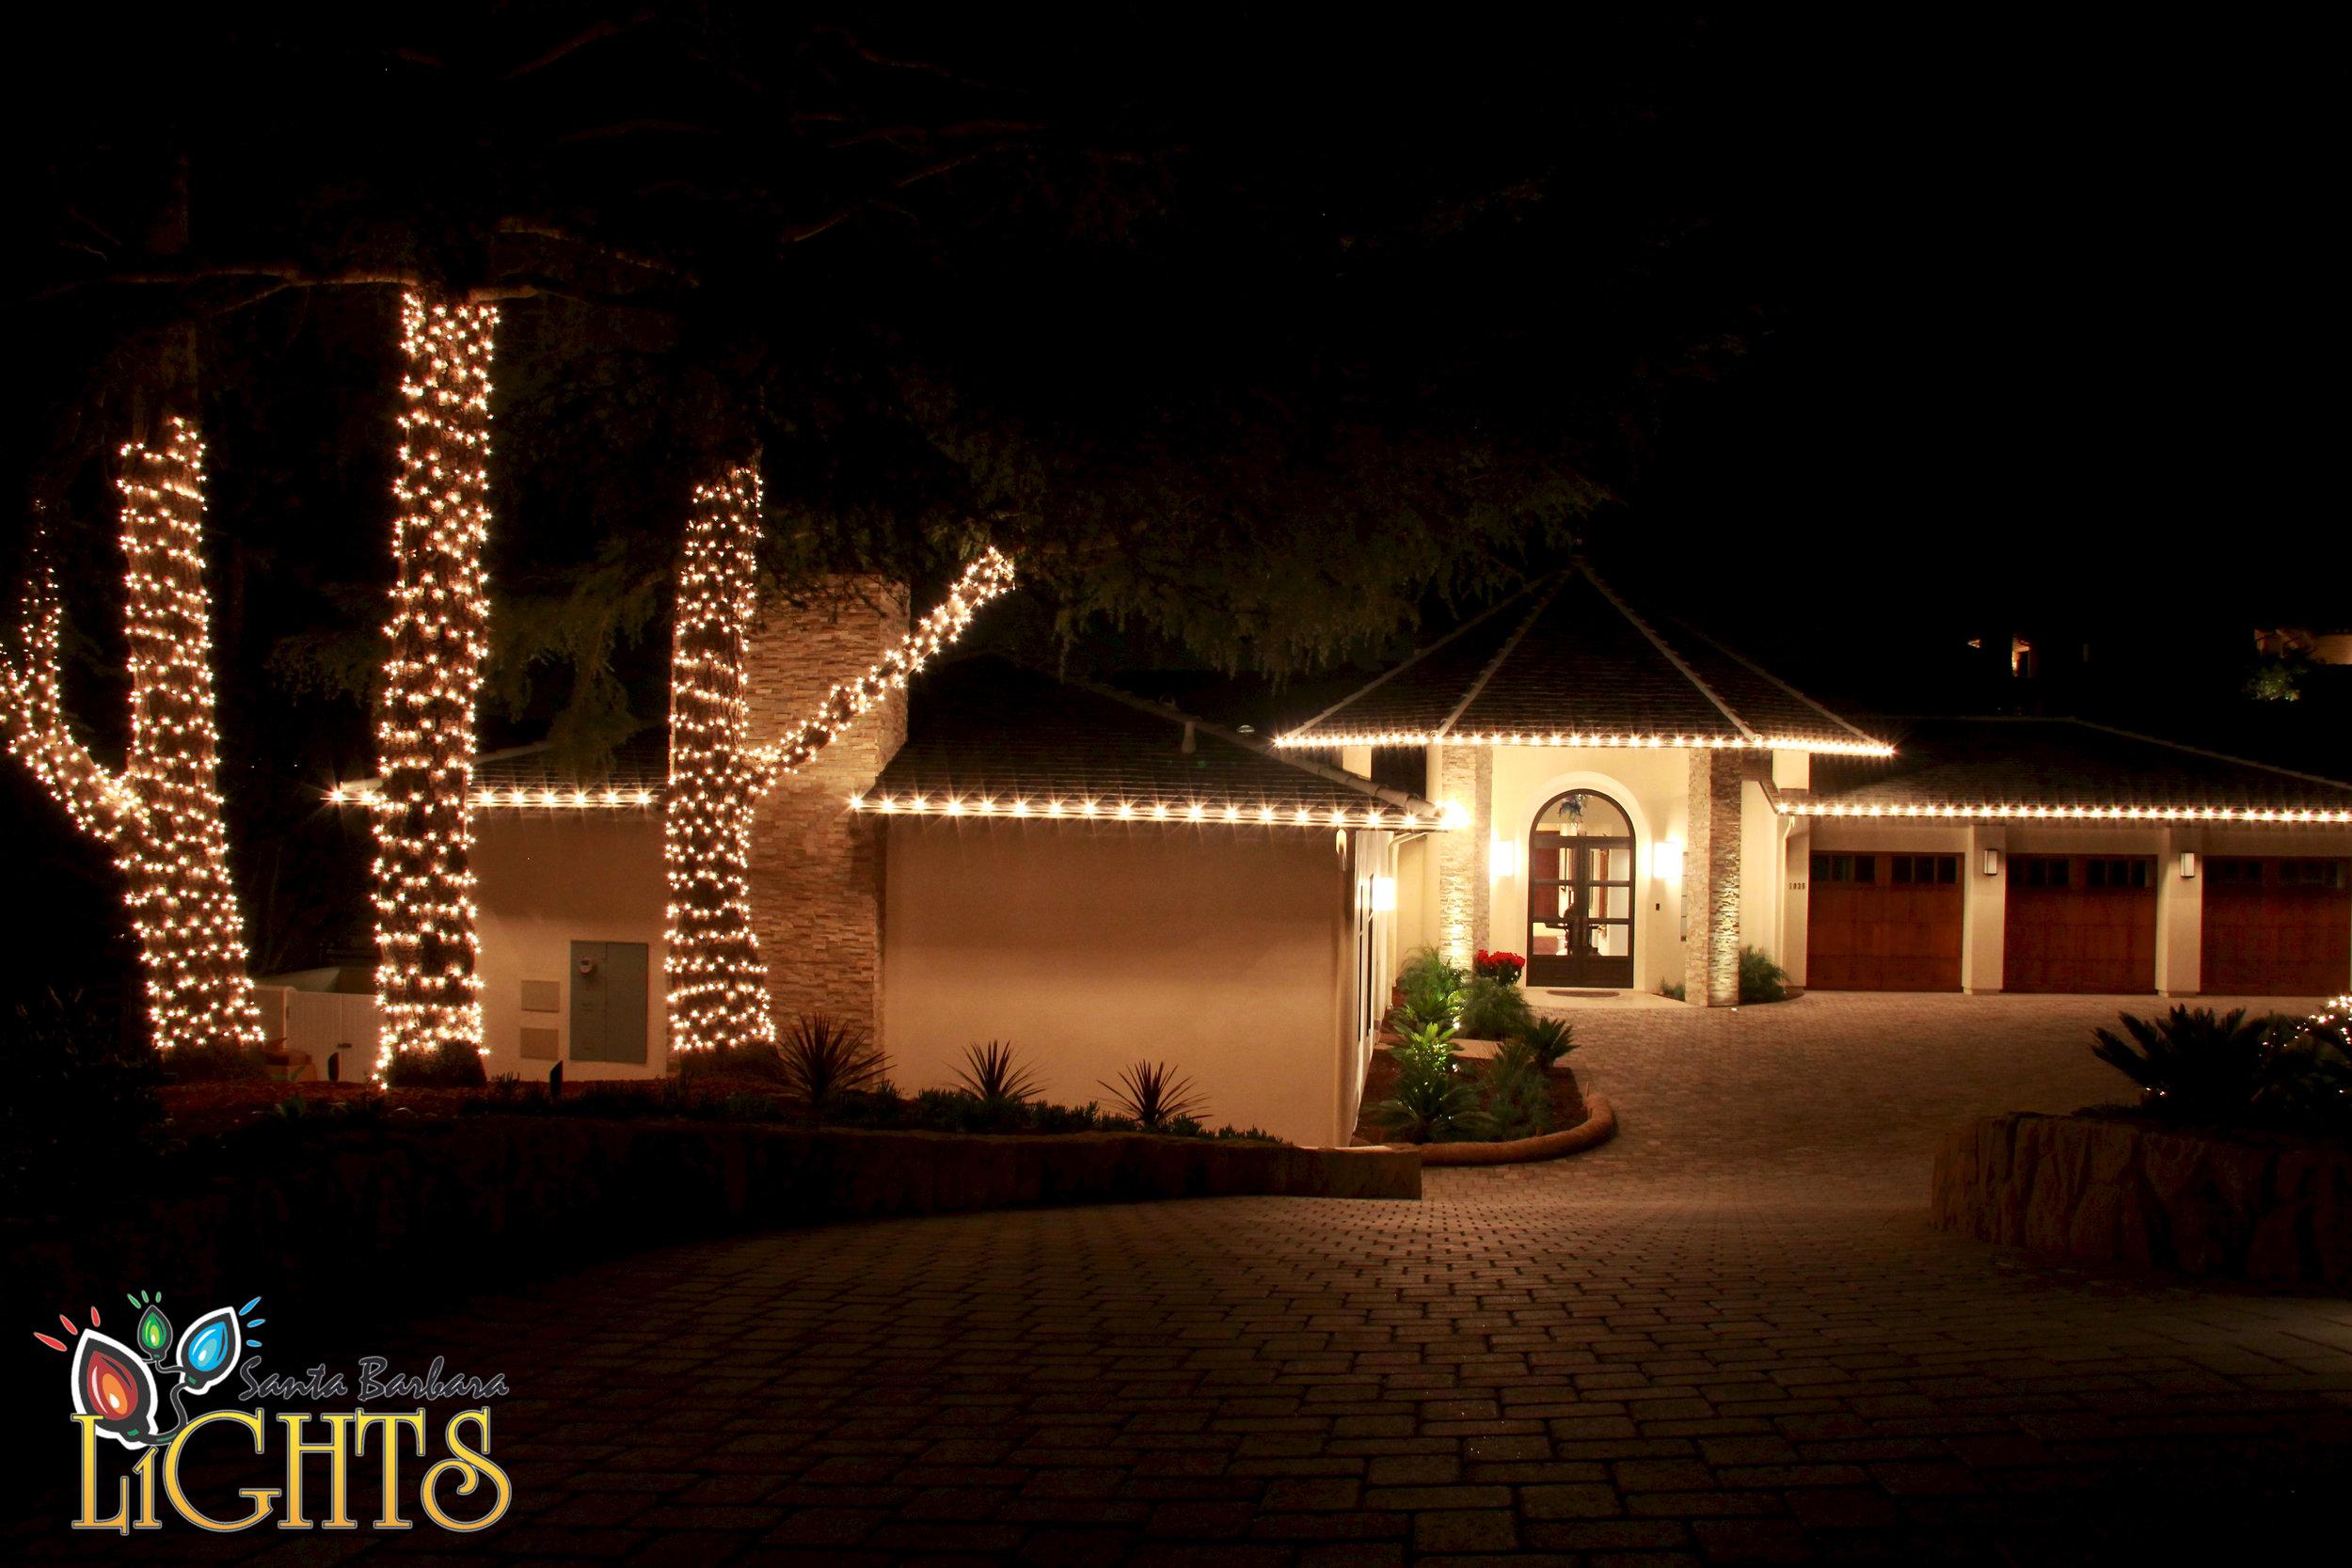 Santa Barbara Lights 2011 Season 013.jpg